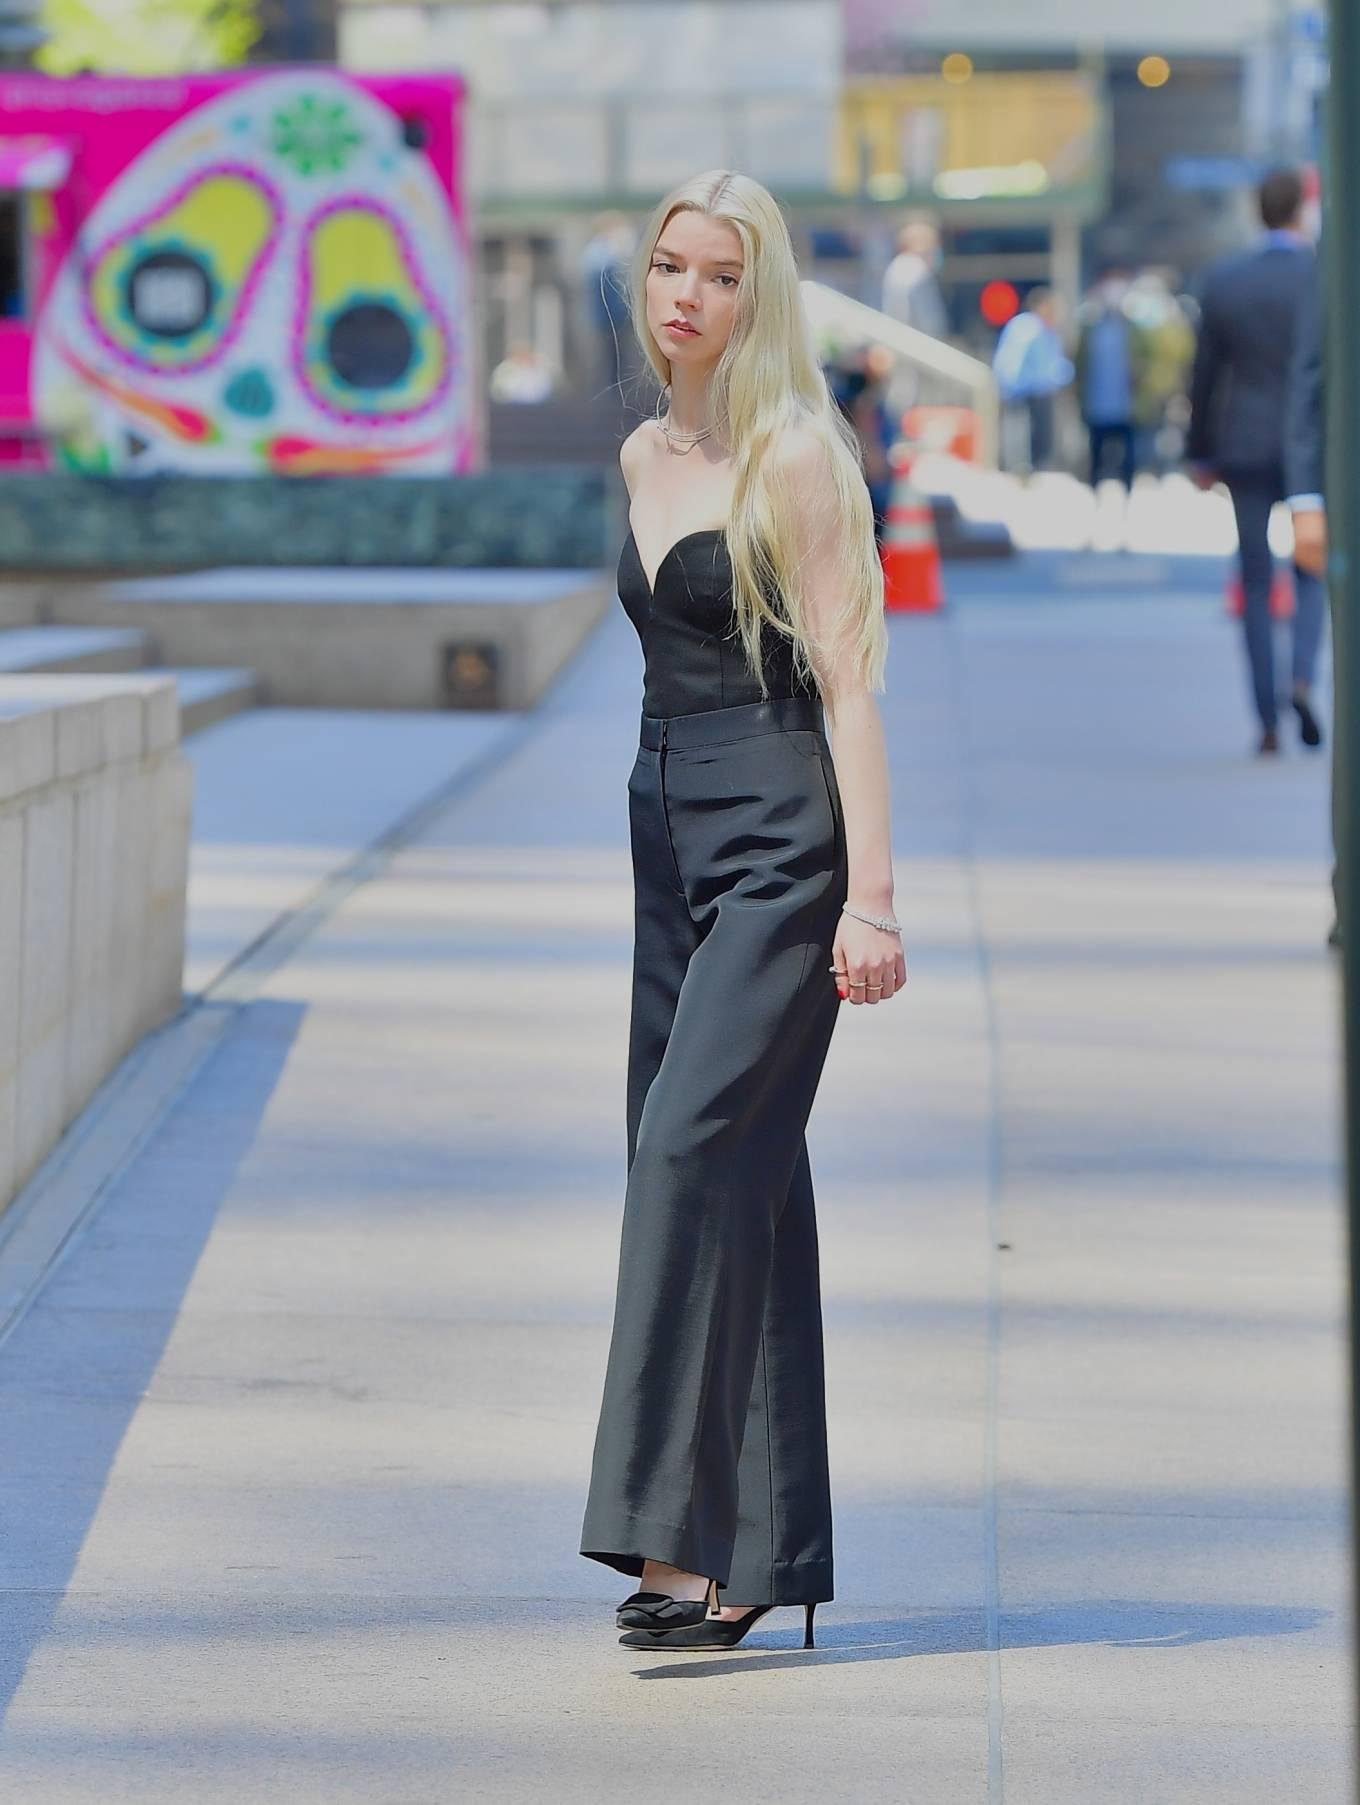 Anya Taylor-Joy 2021 : Anya Taylor-Joy – Shooting advert for Tiffany and Co in New York-08